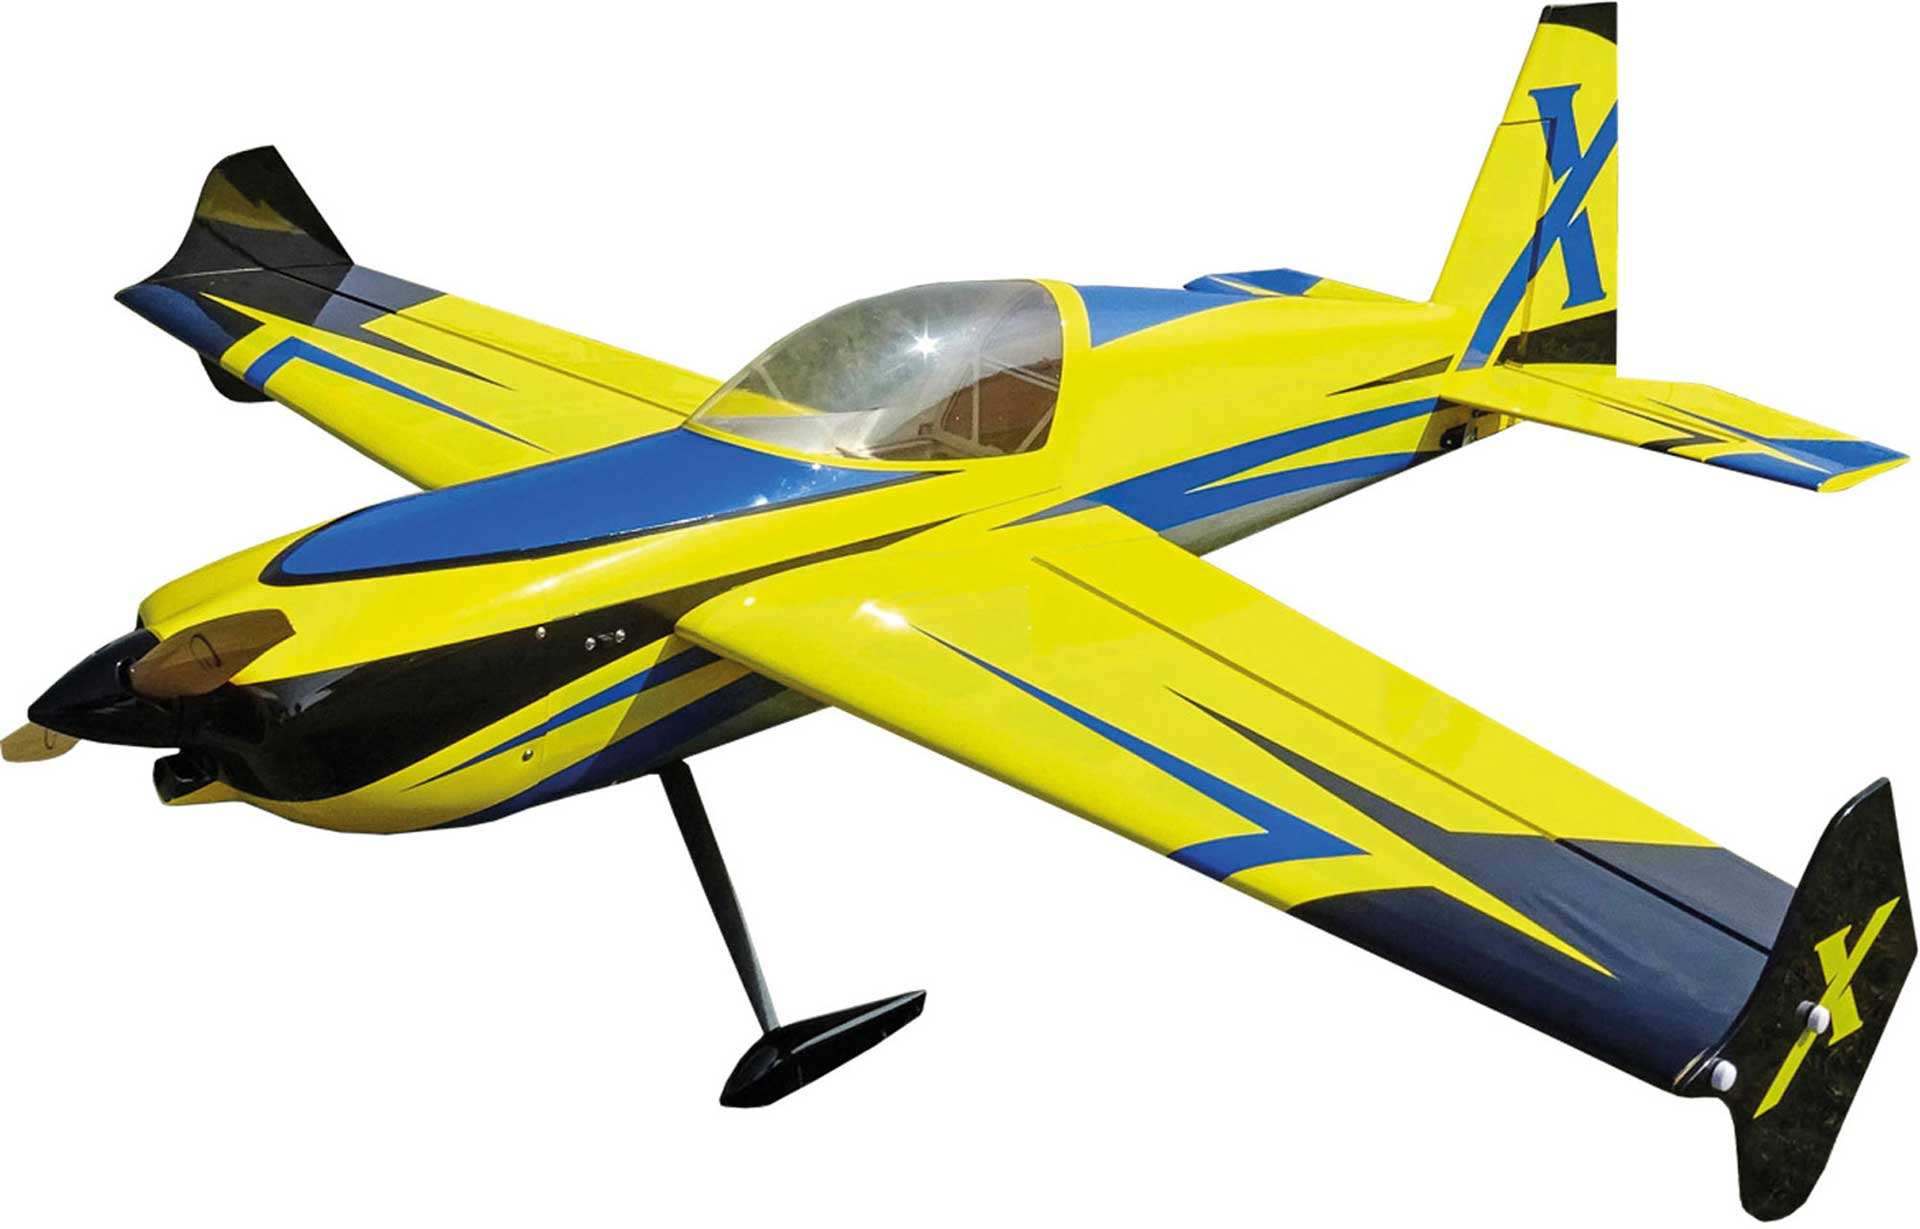 "EXTREMEFLIGHT-RC SLICK 580 52"" ARF YELLOW / BLUE"